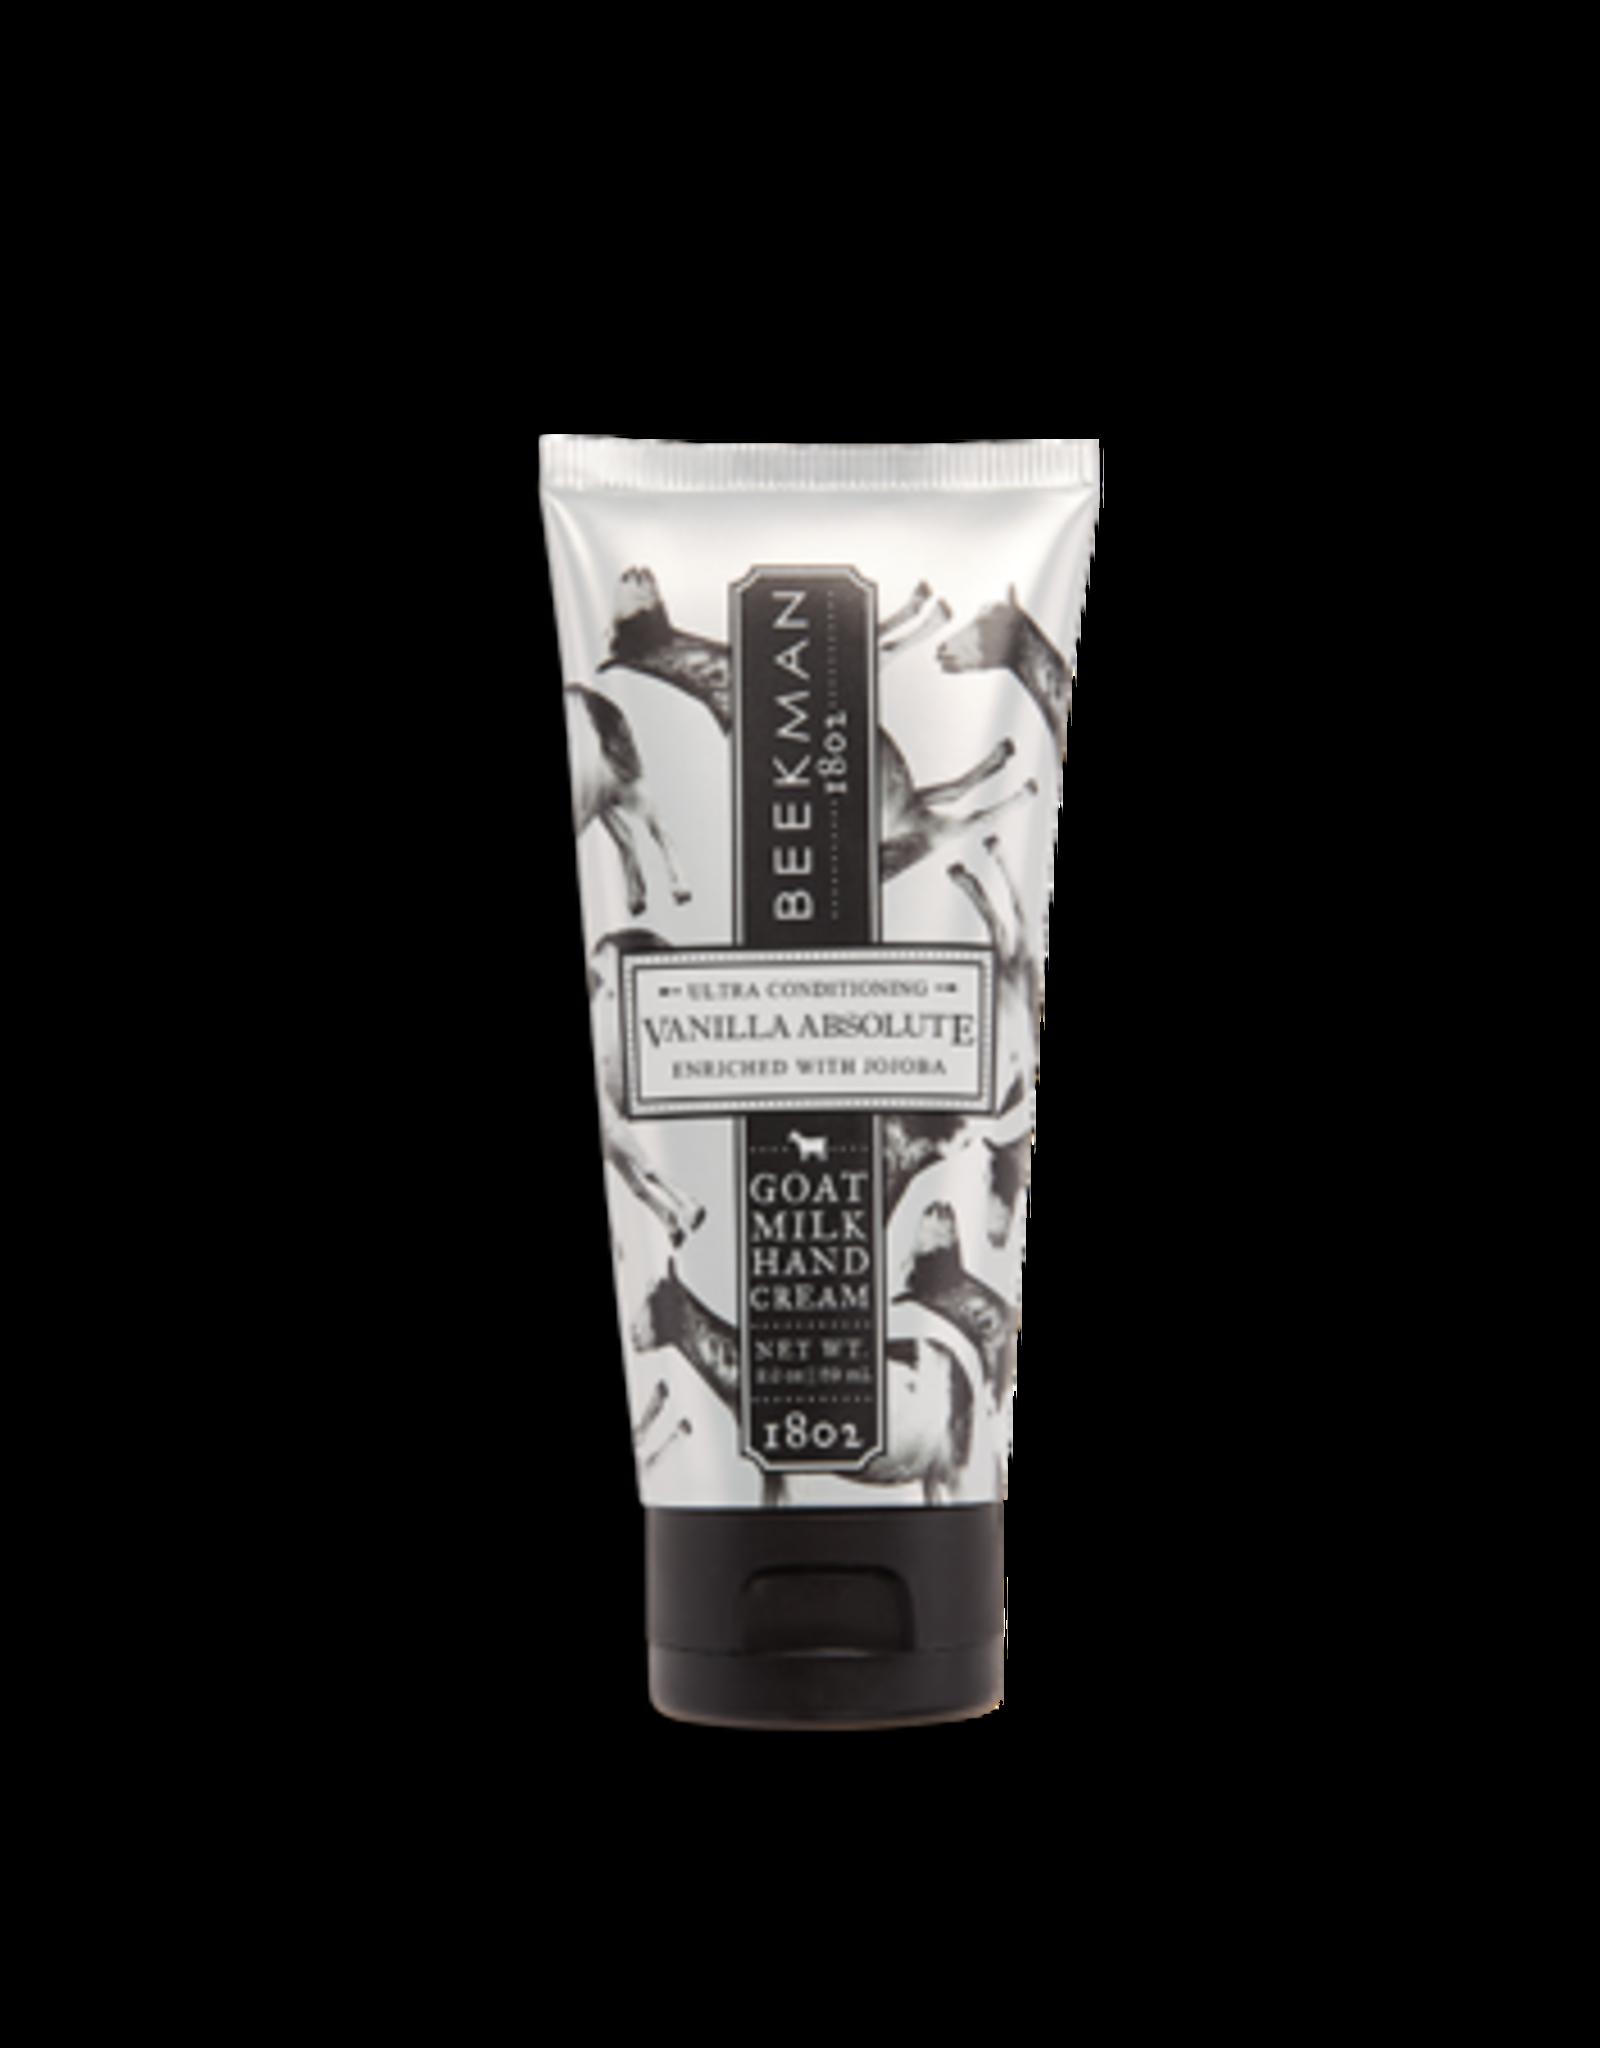 BEEKMAN 1802 Vanilla Absolute Goat Milk Hand Cream